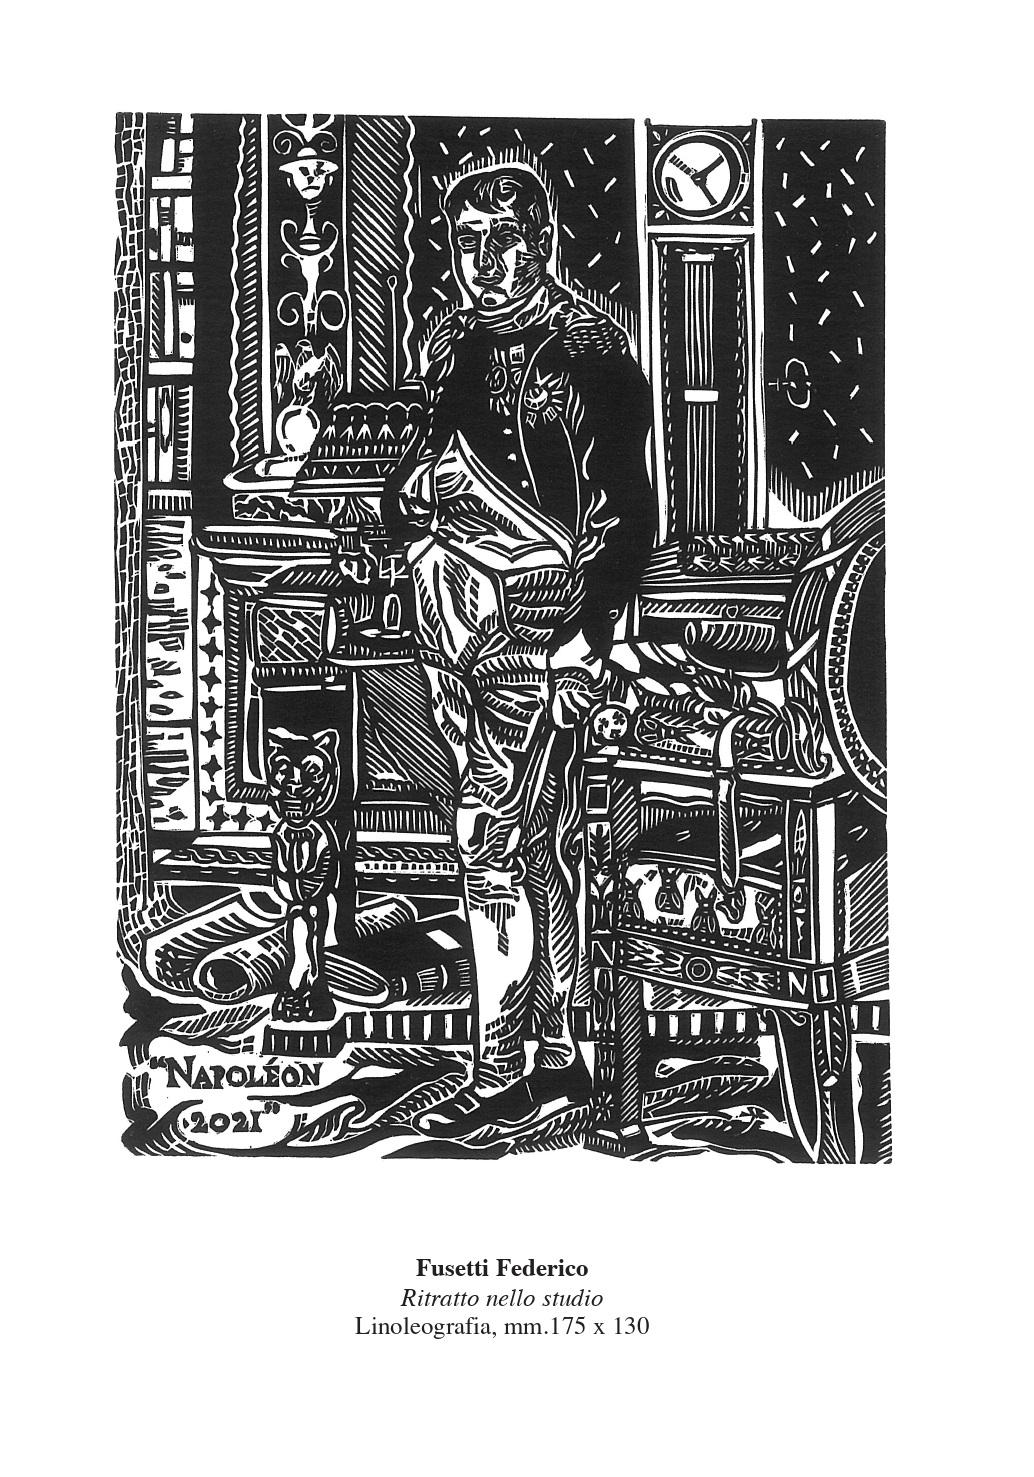 CATALOGO exlibris 2021-79_page-0001